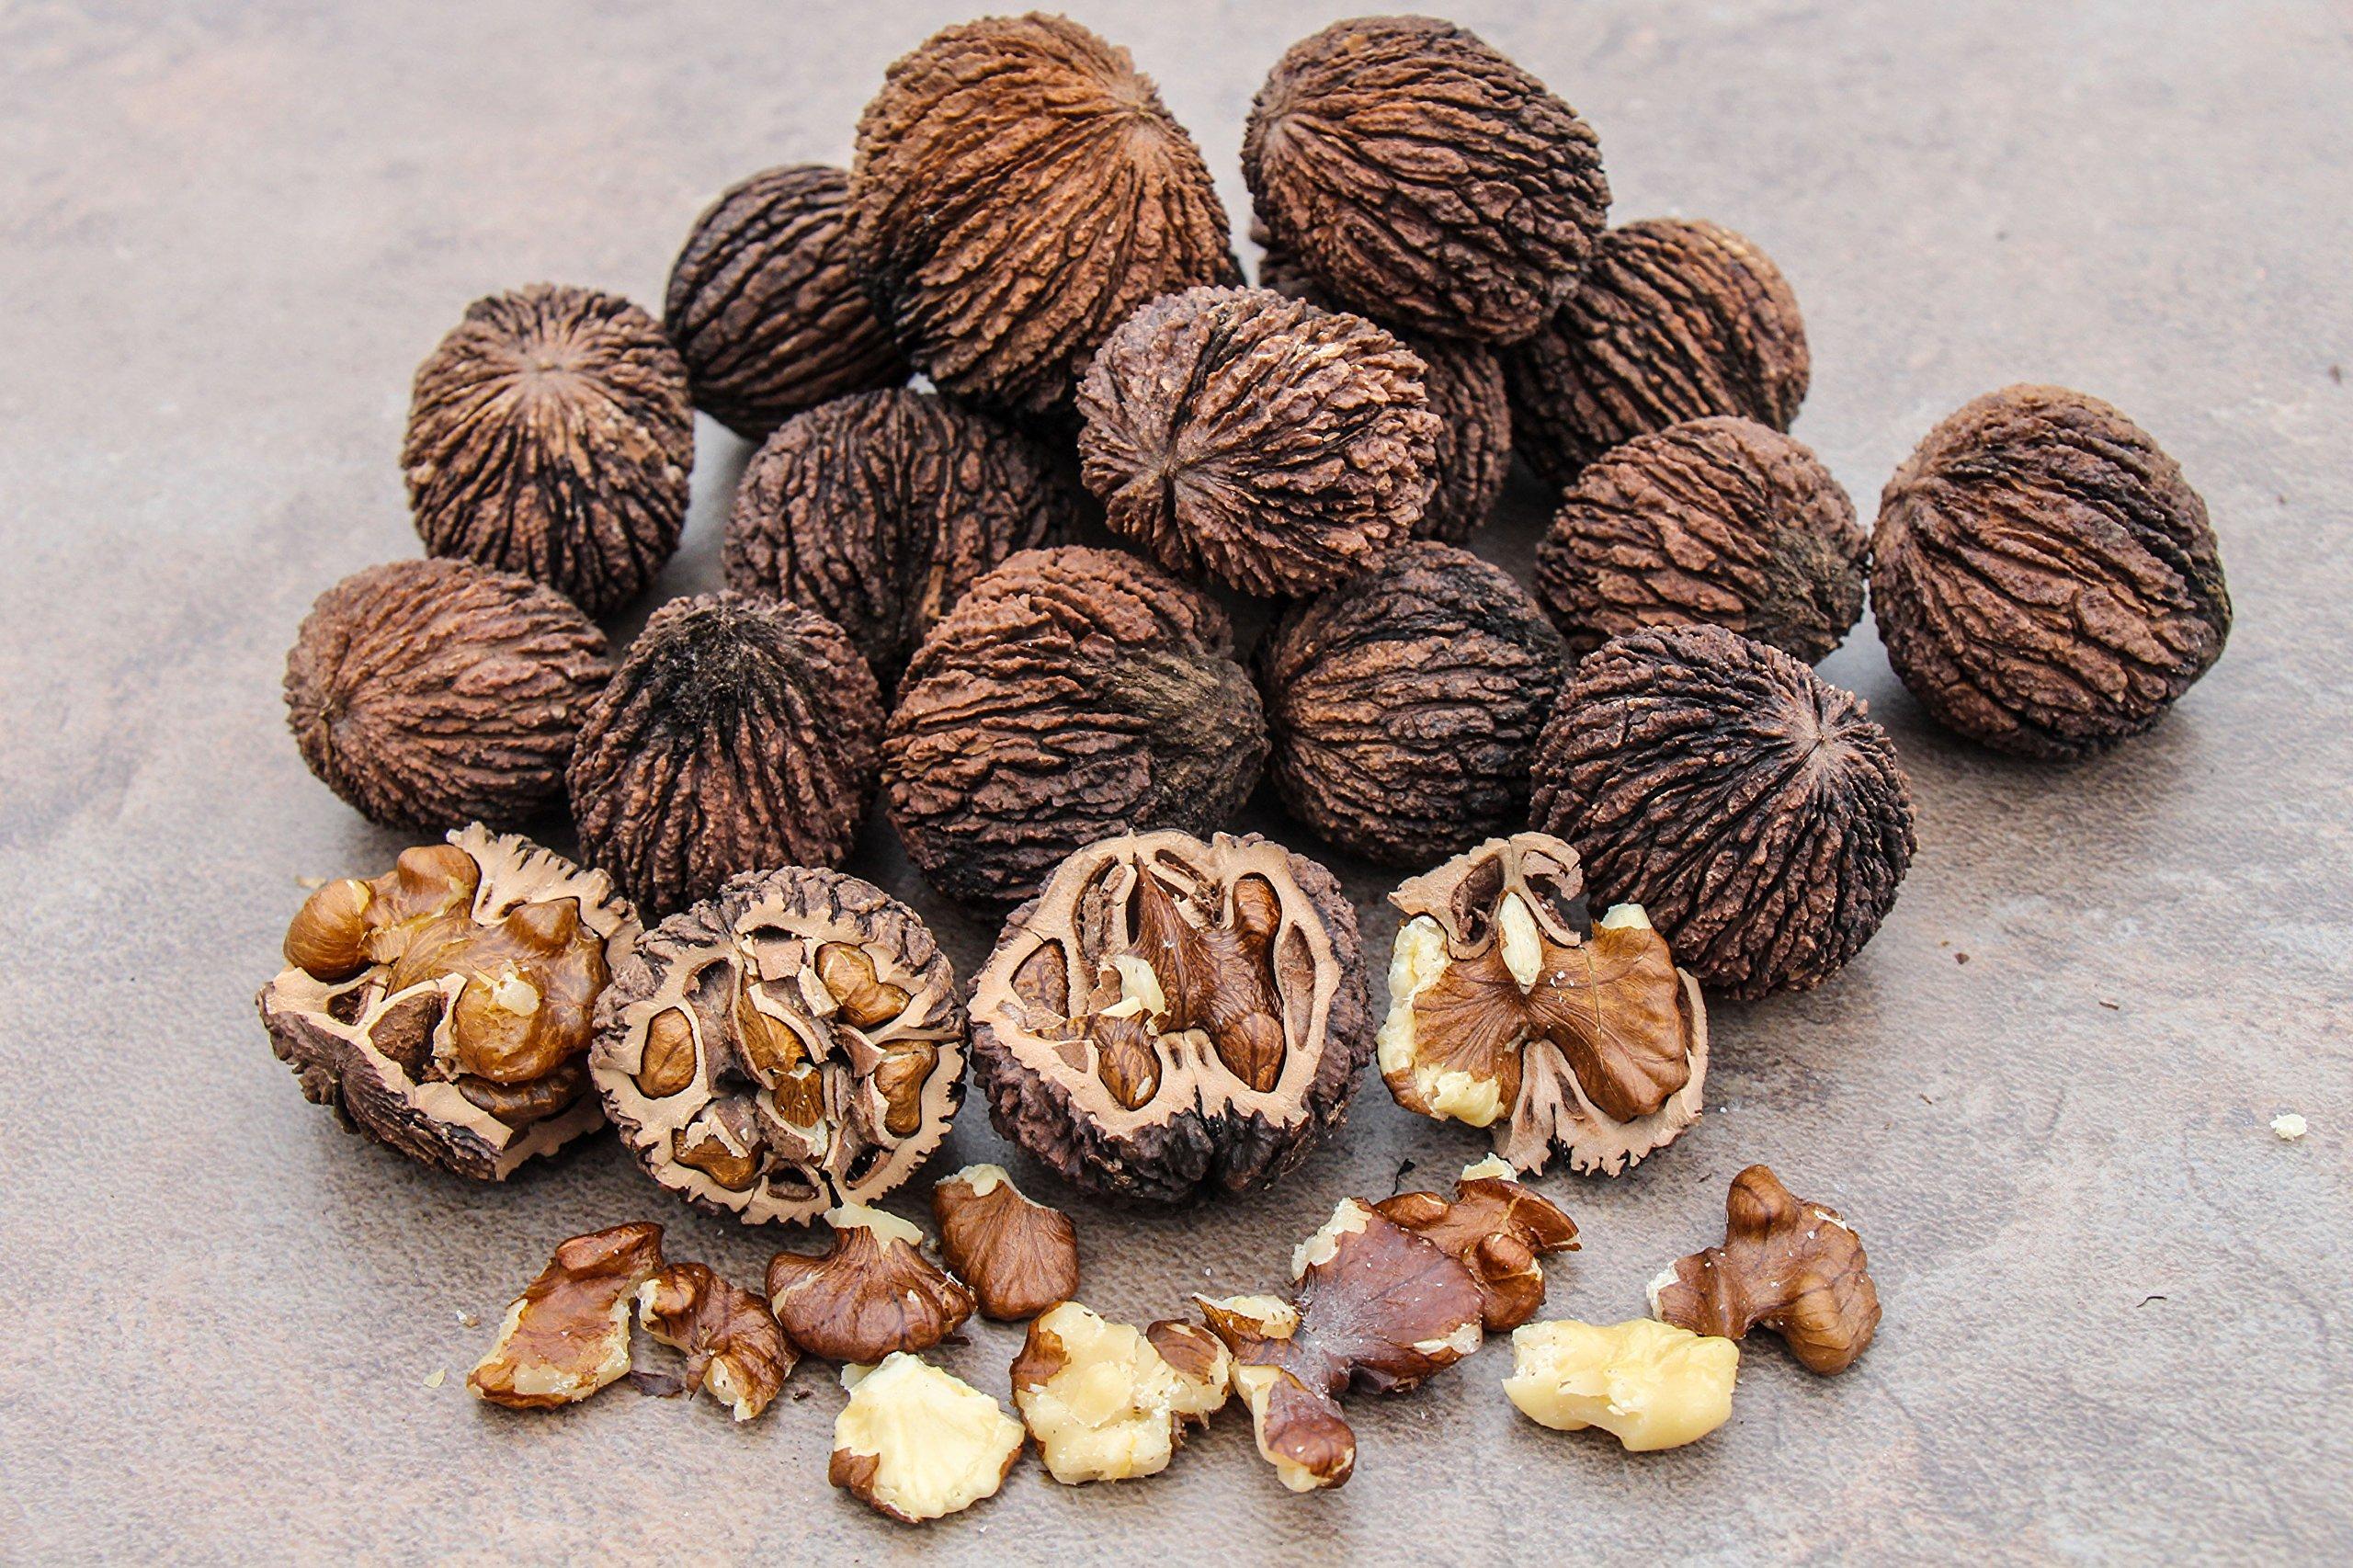 BlueApe Missouri Harvest 2017 Fresh Whole Black Walnuts 5 Pounds In Shell Organic Perfect Squirrel Food - Black Walnut Tree Seeds - Juglans Nigra